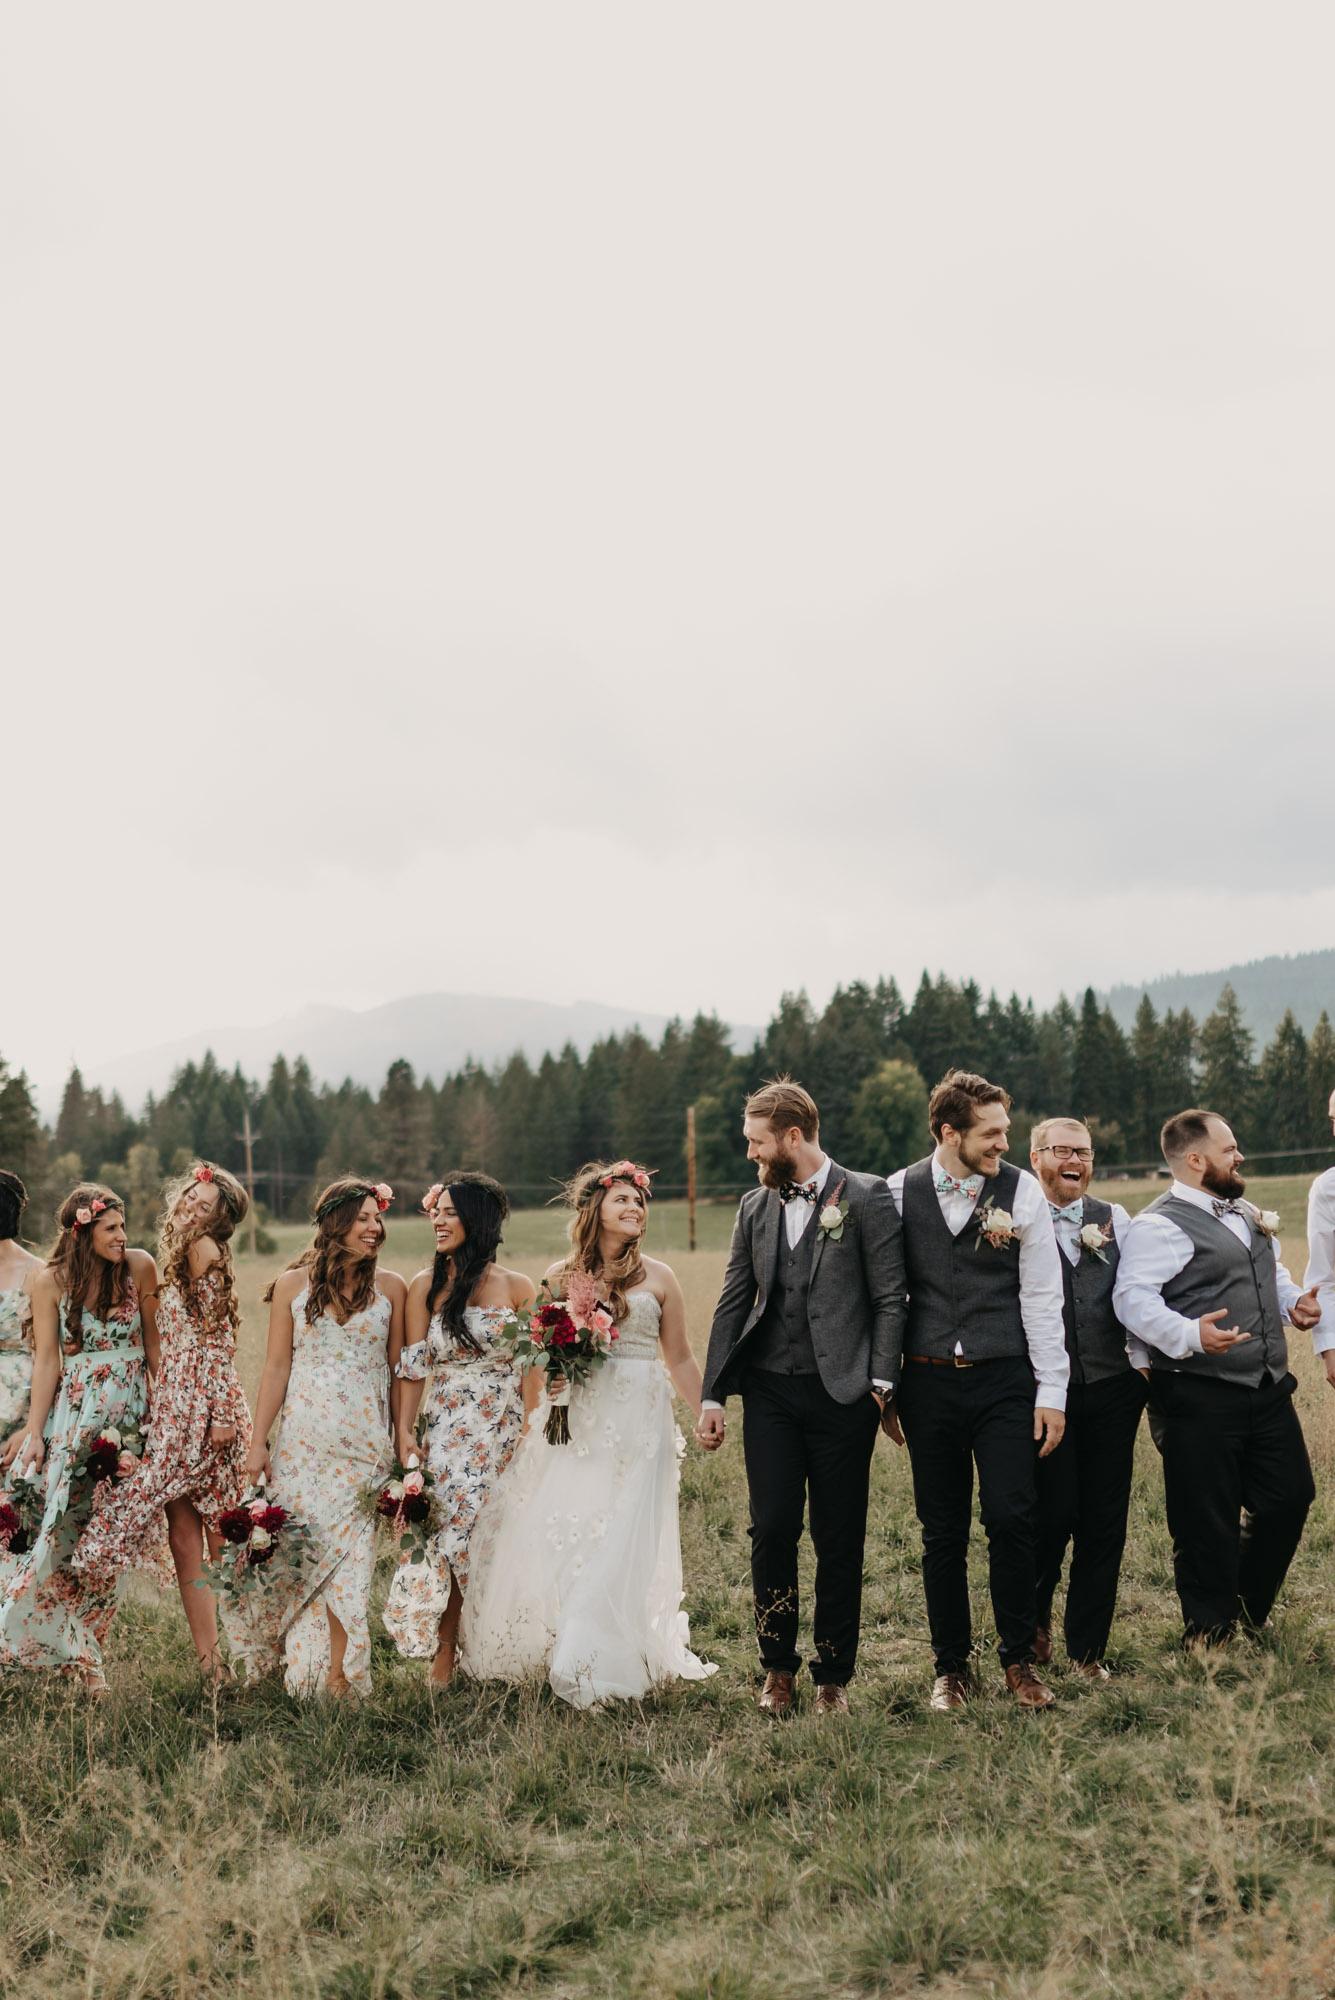 Bridal-Party-Free-People-Flower-Dresses-Washington-Wedding-8626.jpg